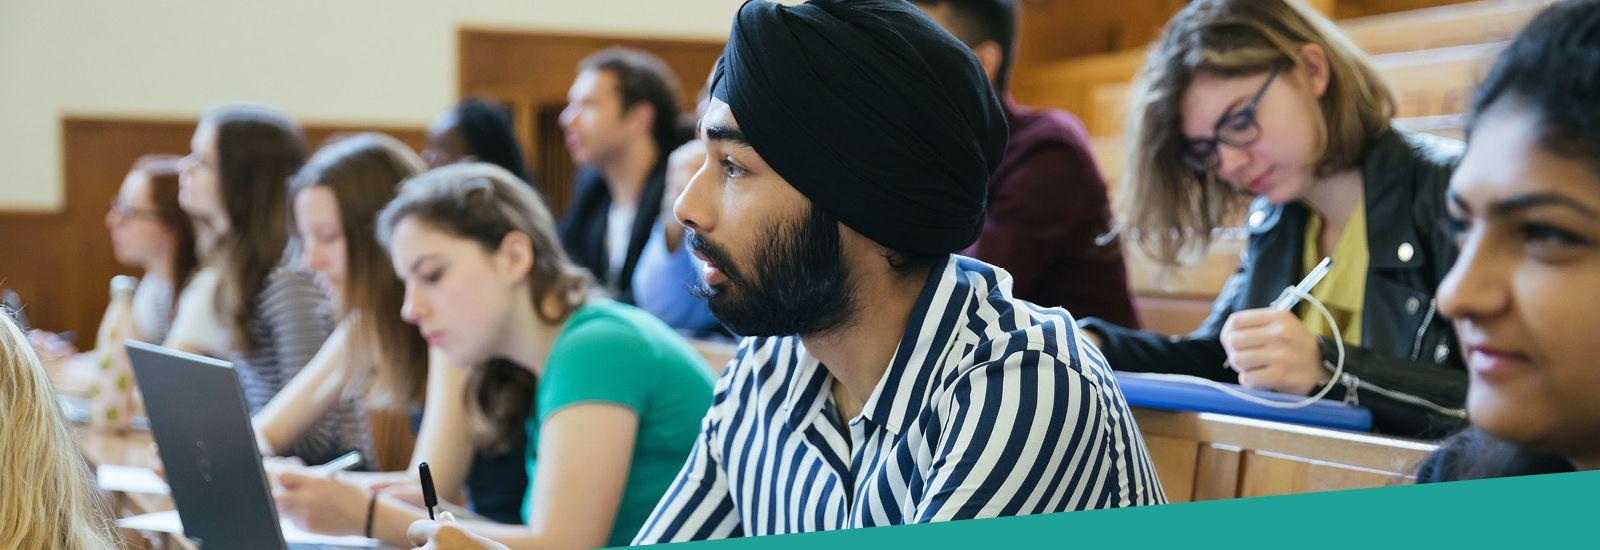 Undergrad students in lecture